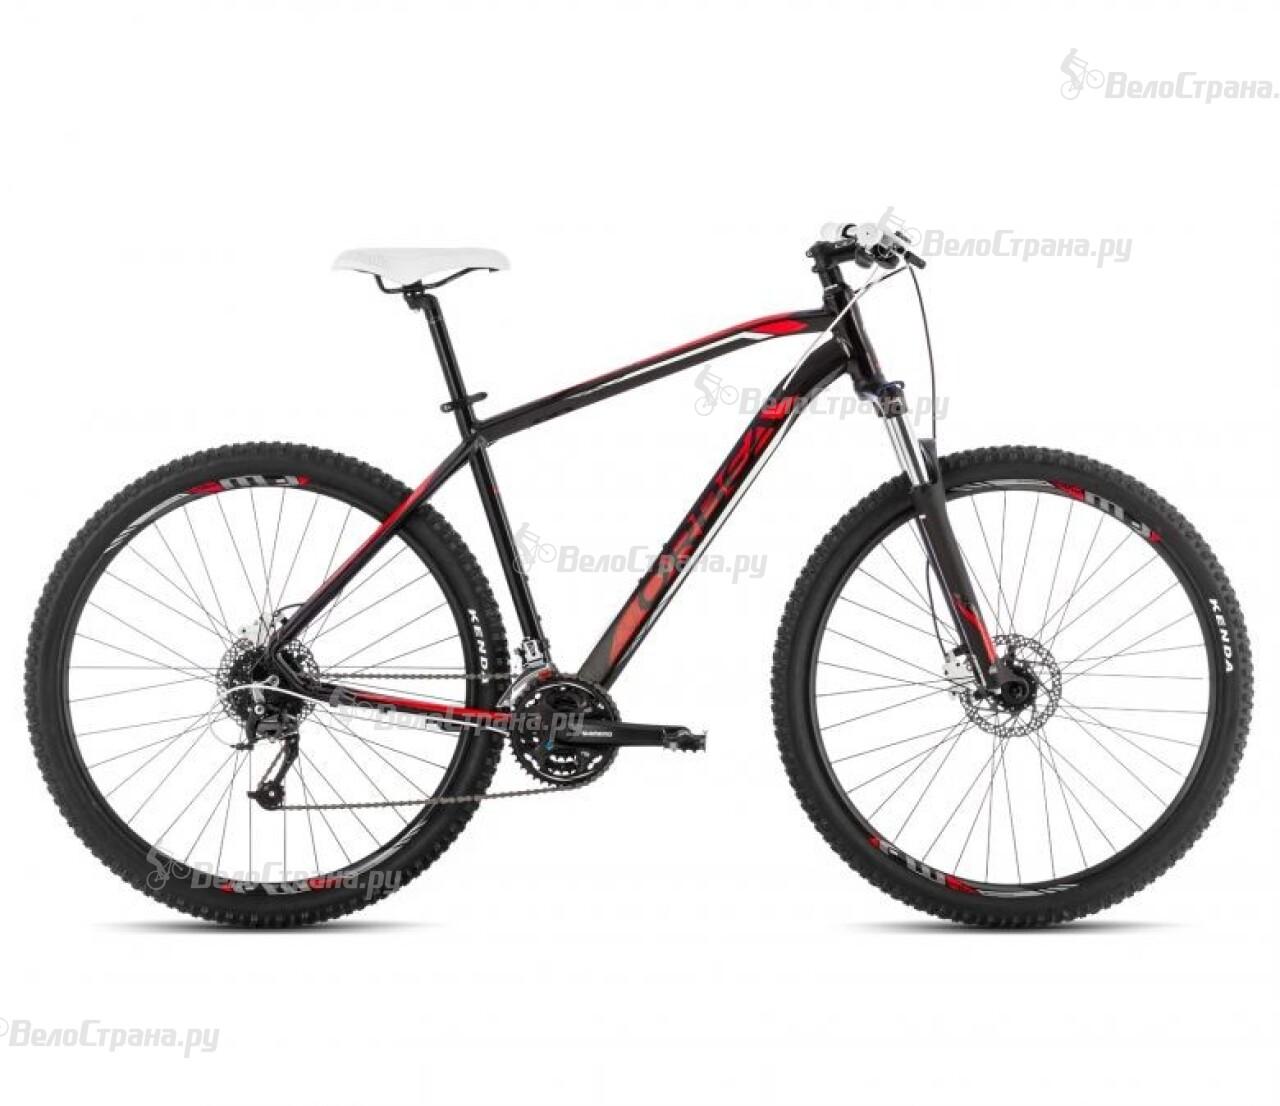 Велосипед Orbea Mx 29 30 Dama (2014) велосипед orbea mx 24 xc 2014